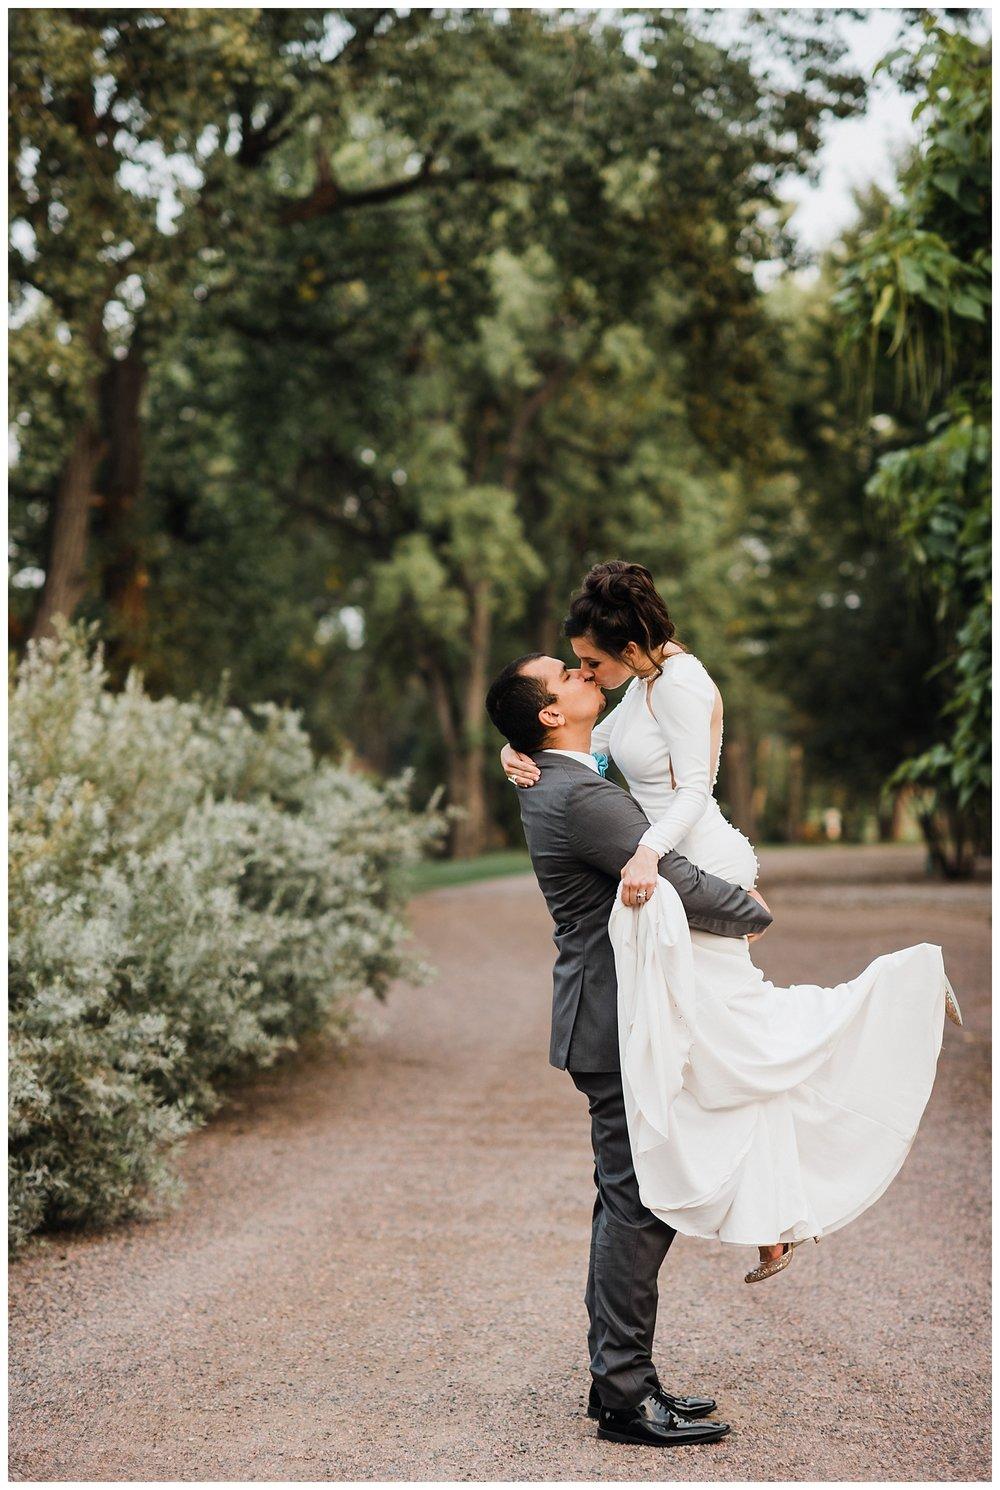 The_Hamptons_Wedding_Photographer_Apollo_Fields_Weddings_Photography_NY_018.jpg